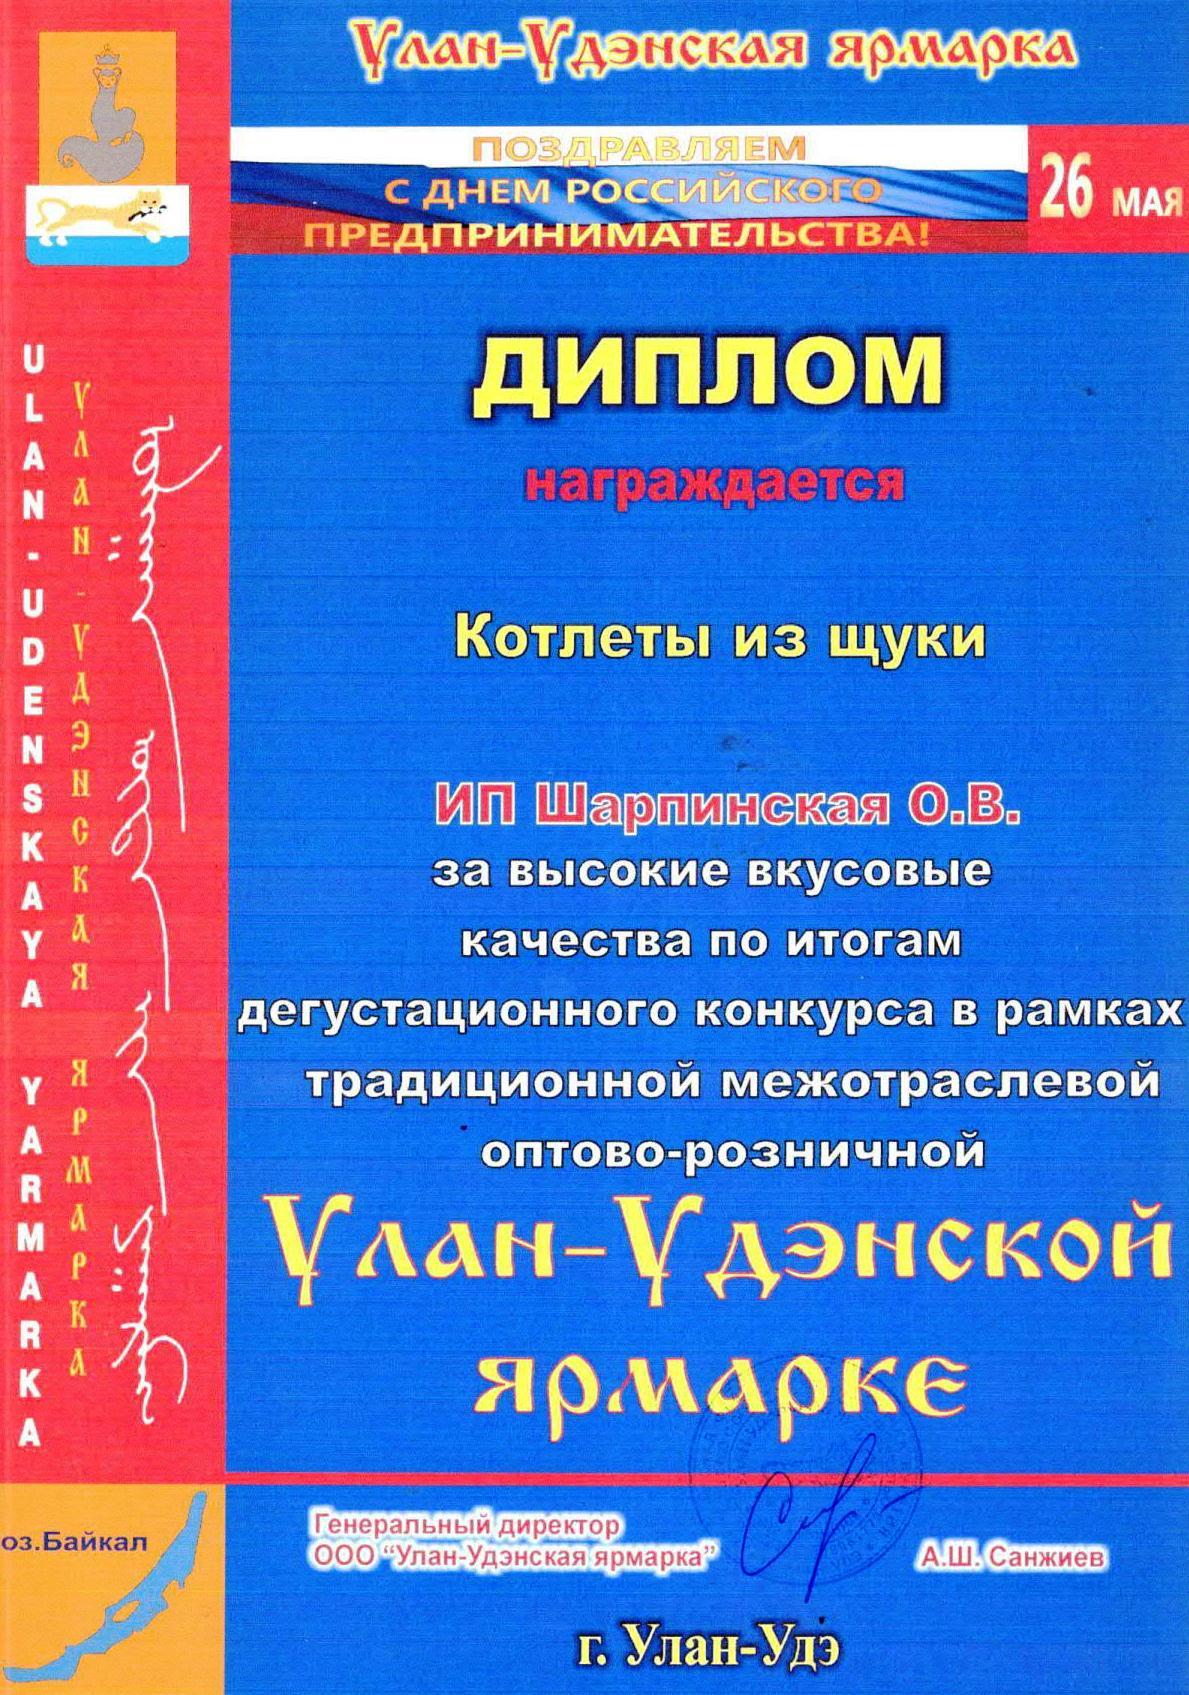 УУ 2014(1) 1